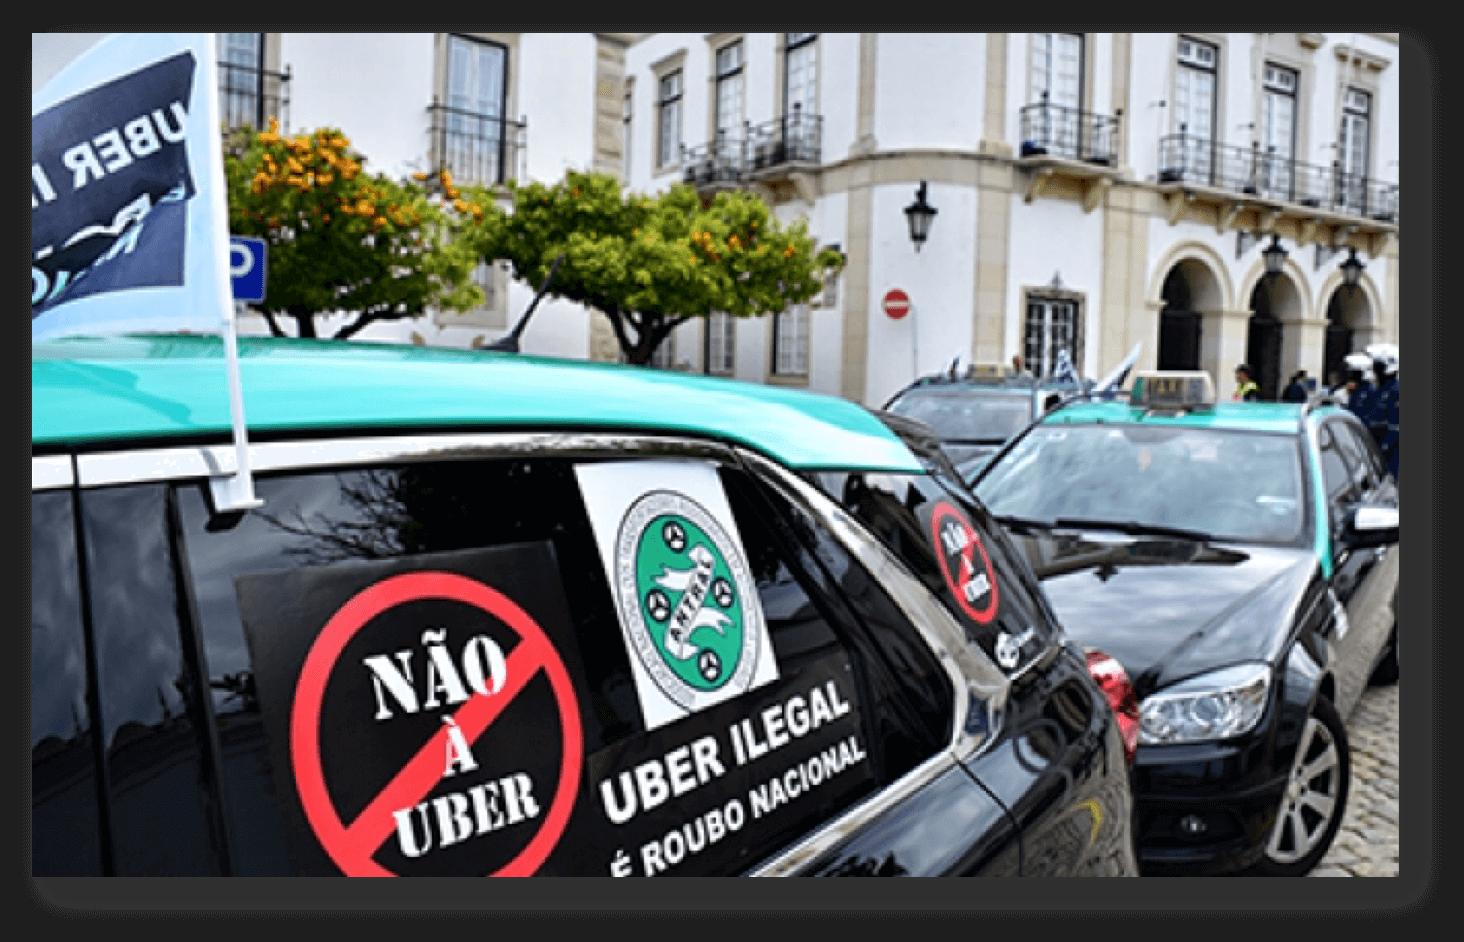 Taxistas portugueses protestam contra a Uber